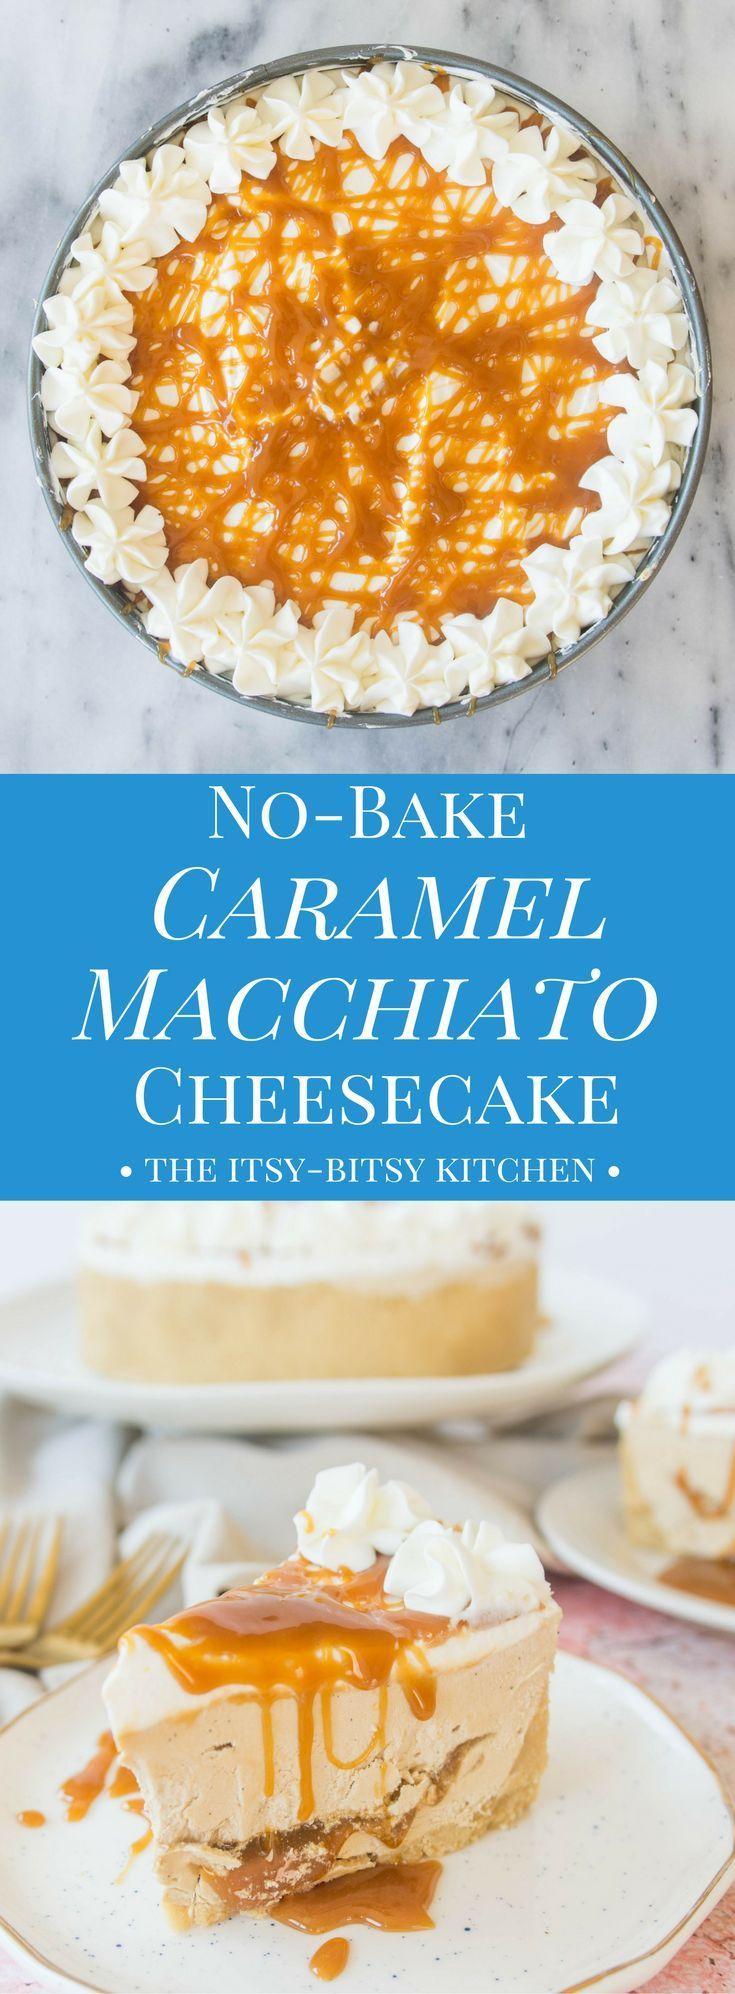 Best 1000+ Dessert & Snack Recipes images on Pinterest | Dessert ...